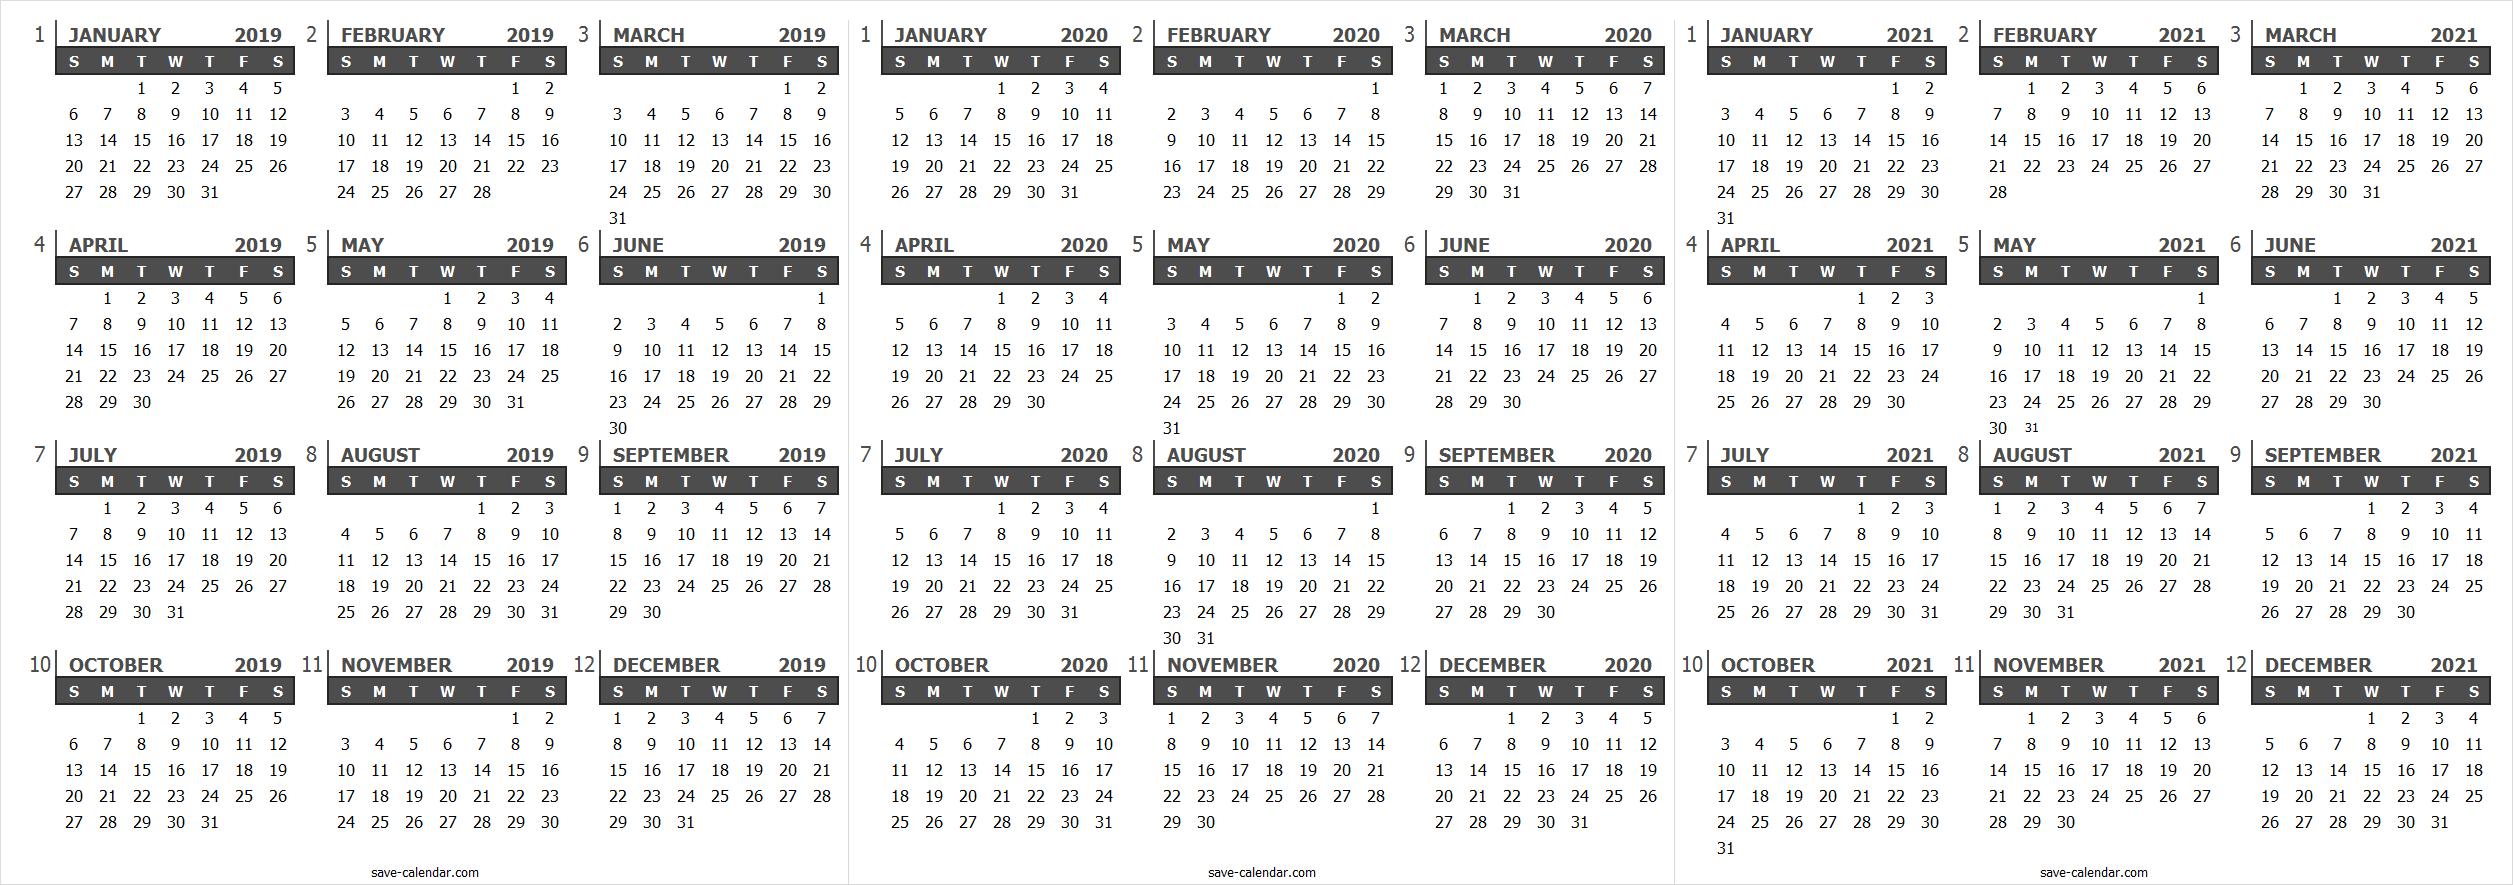 Calendar 2019 2020 2021 Uk Free Printable Calendar Calendar 2019 And 2020 Templates Printable Free